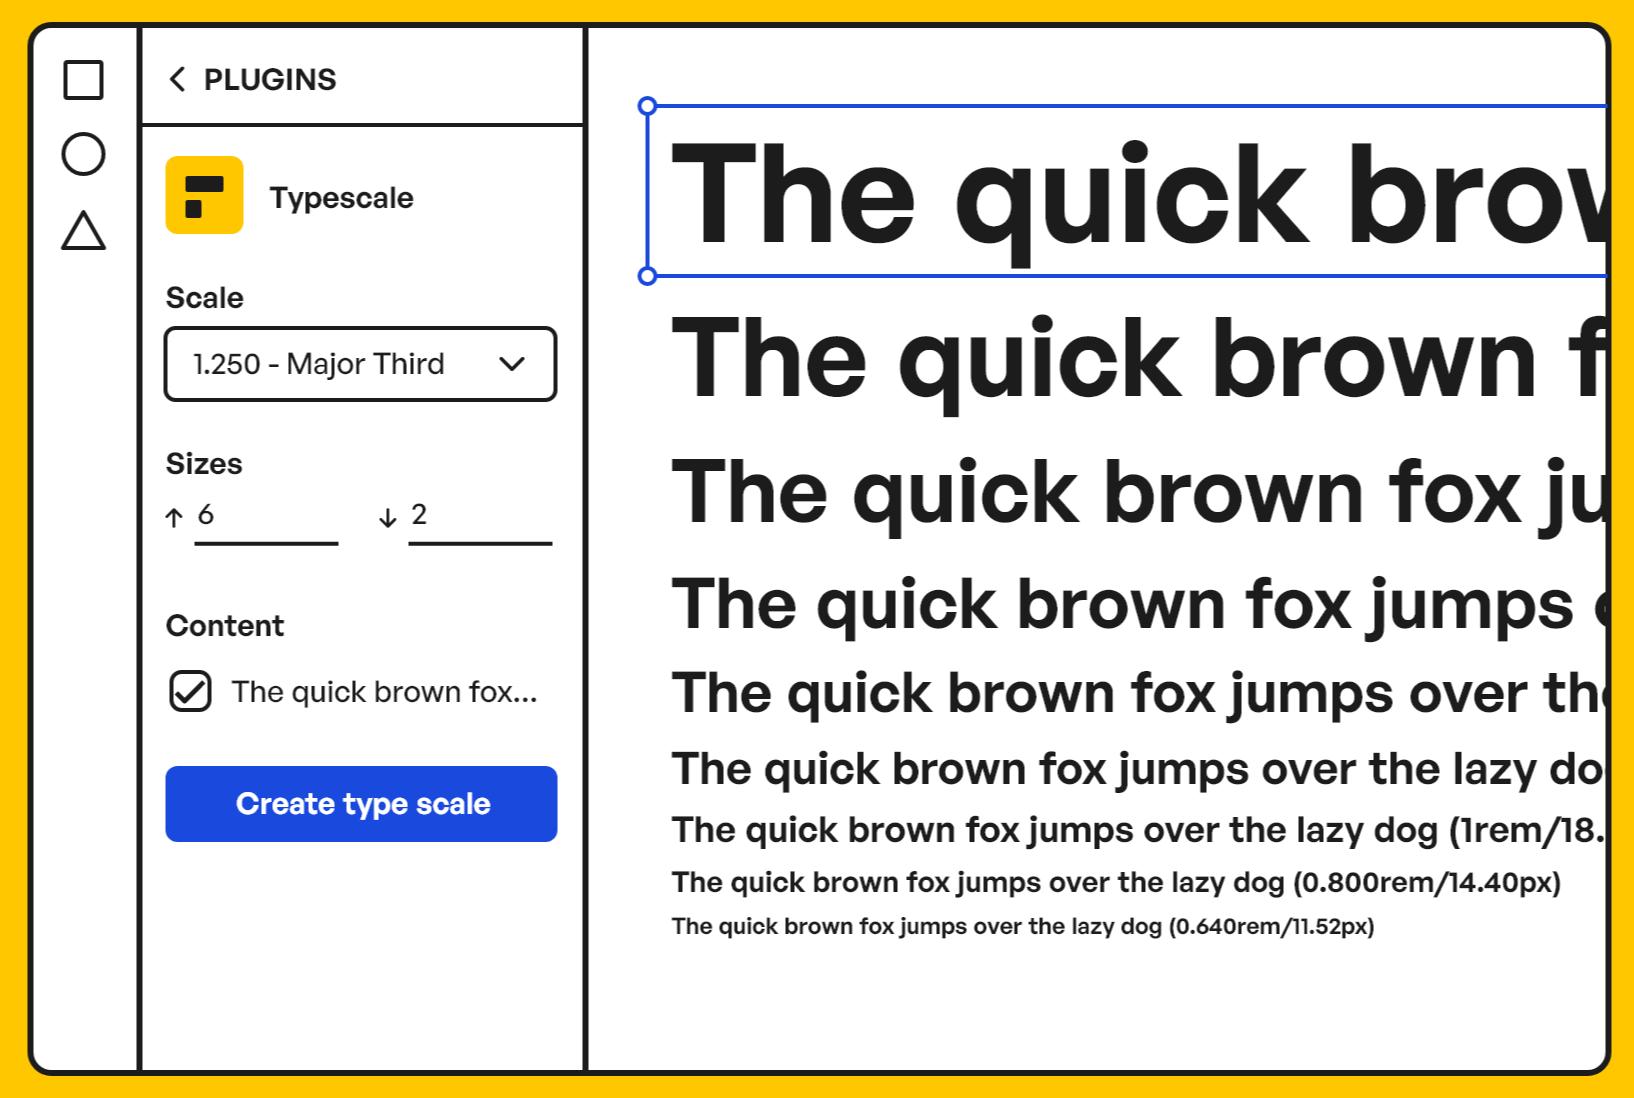 Typescale illustration